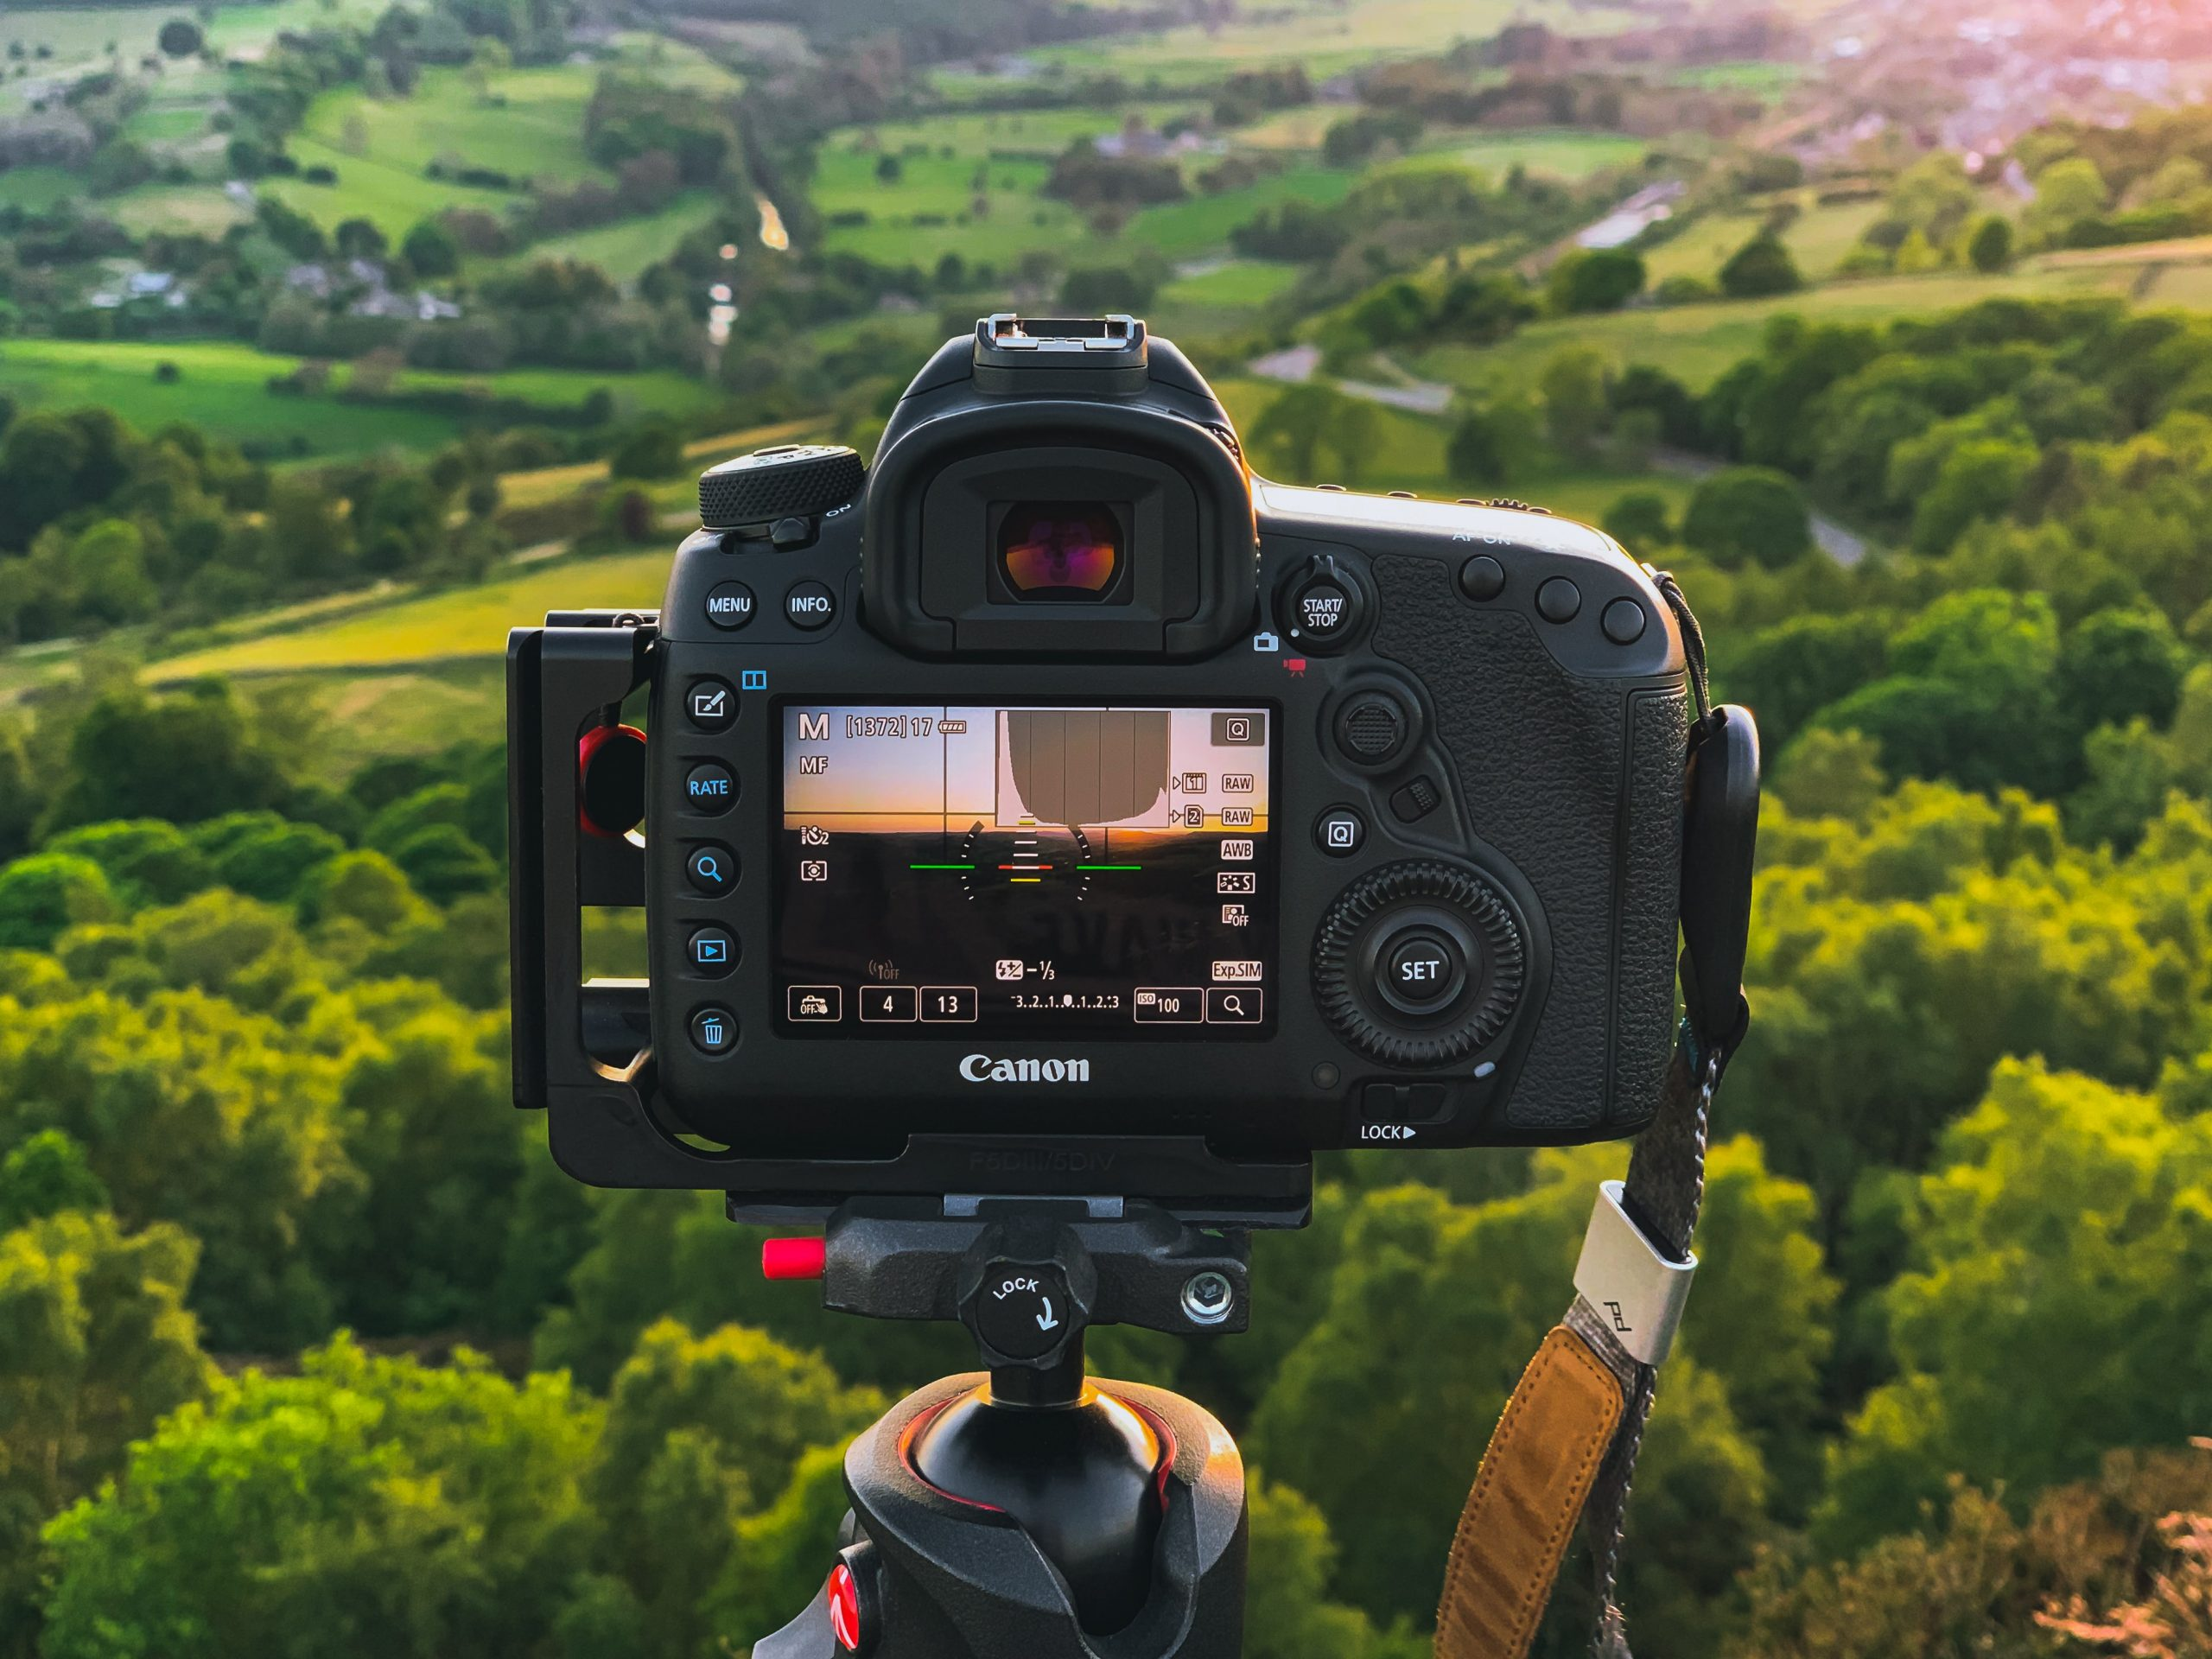 Camera looking across green rolling hills